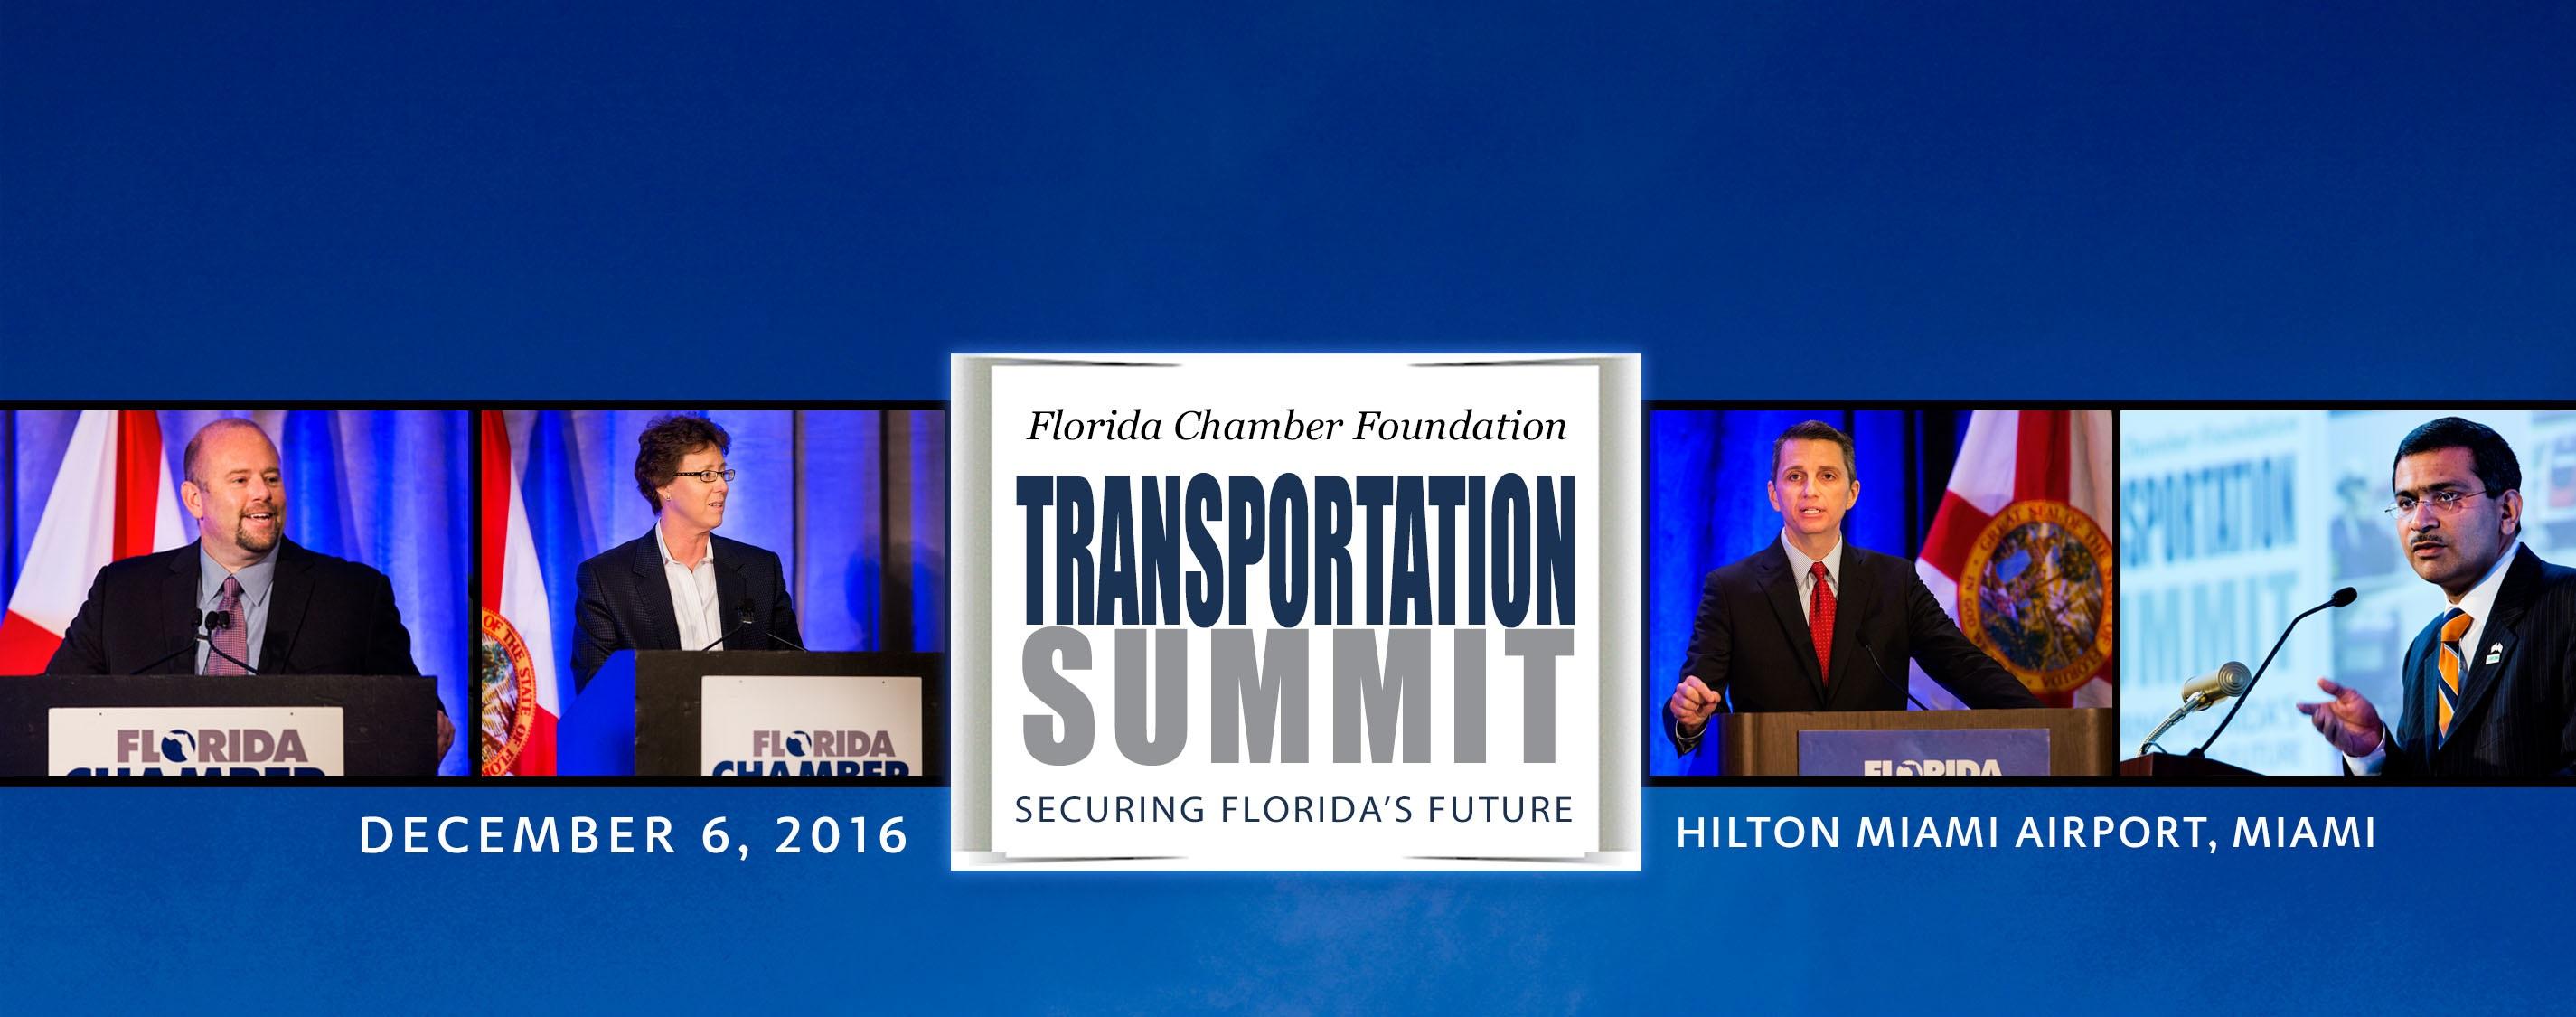 Transportation Summit 2016 banner